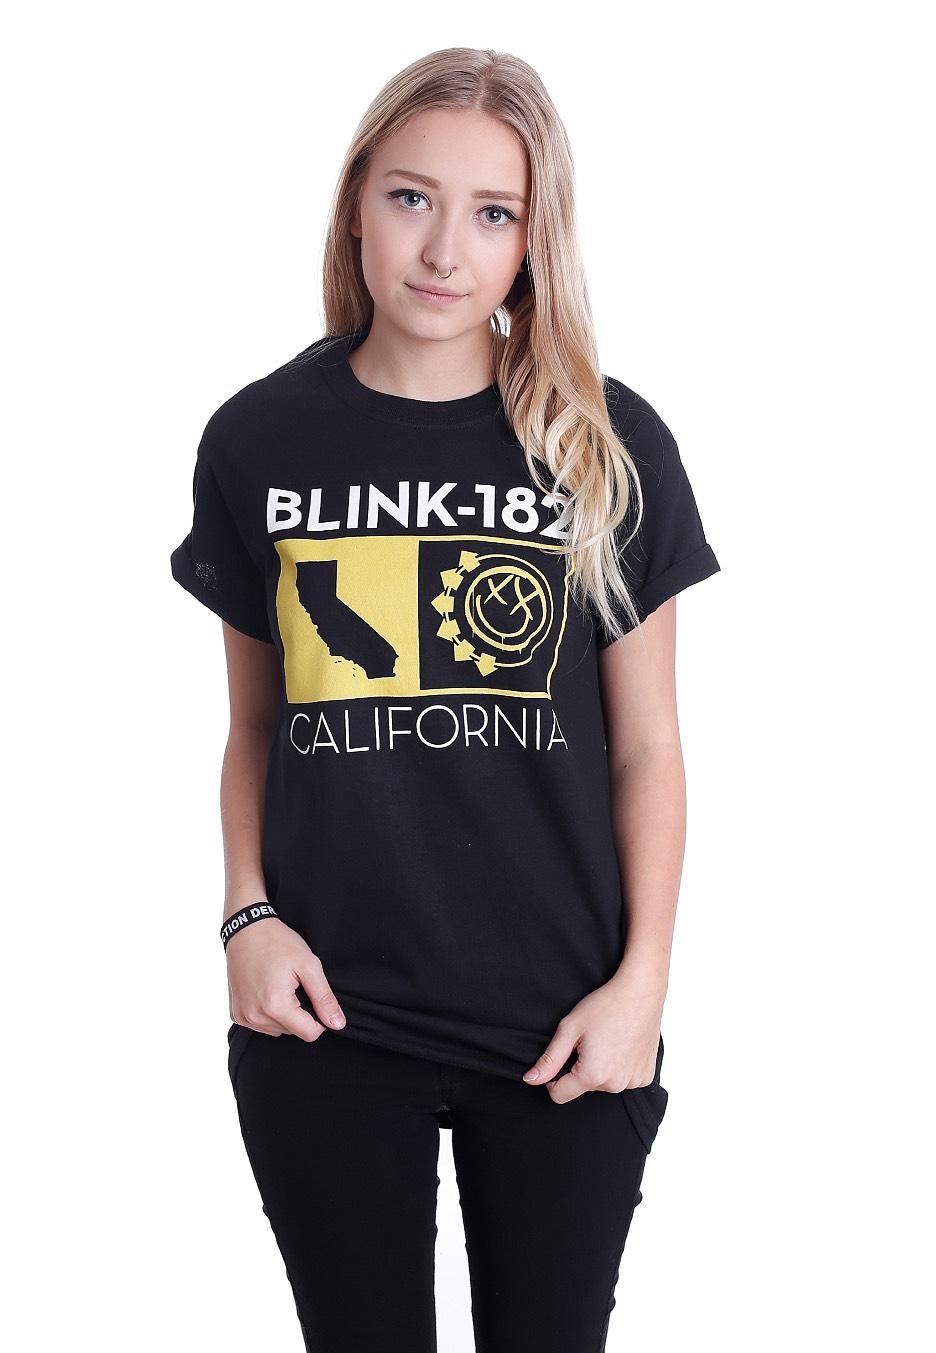 Blink 182 Sweater